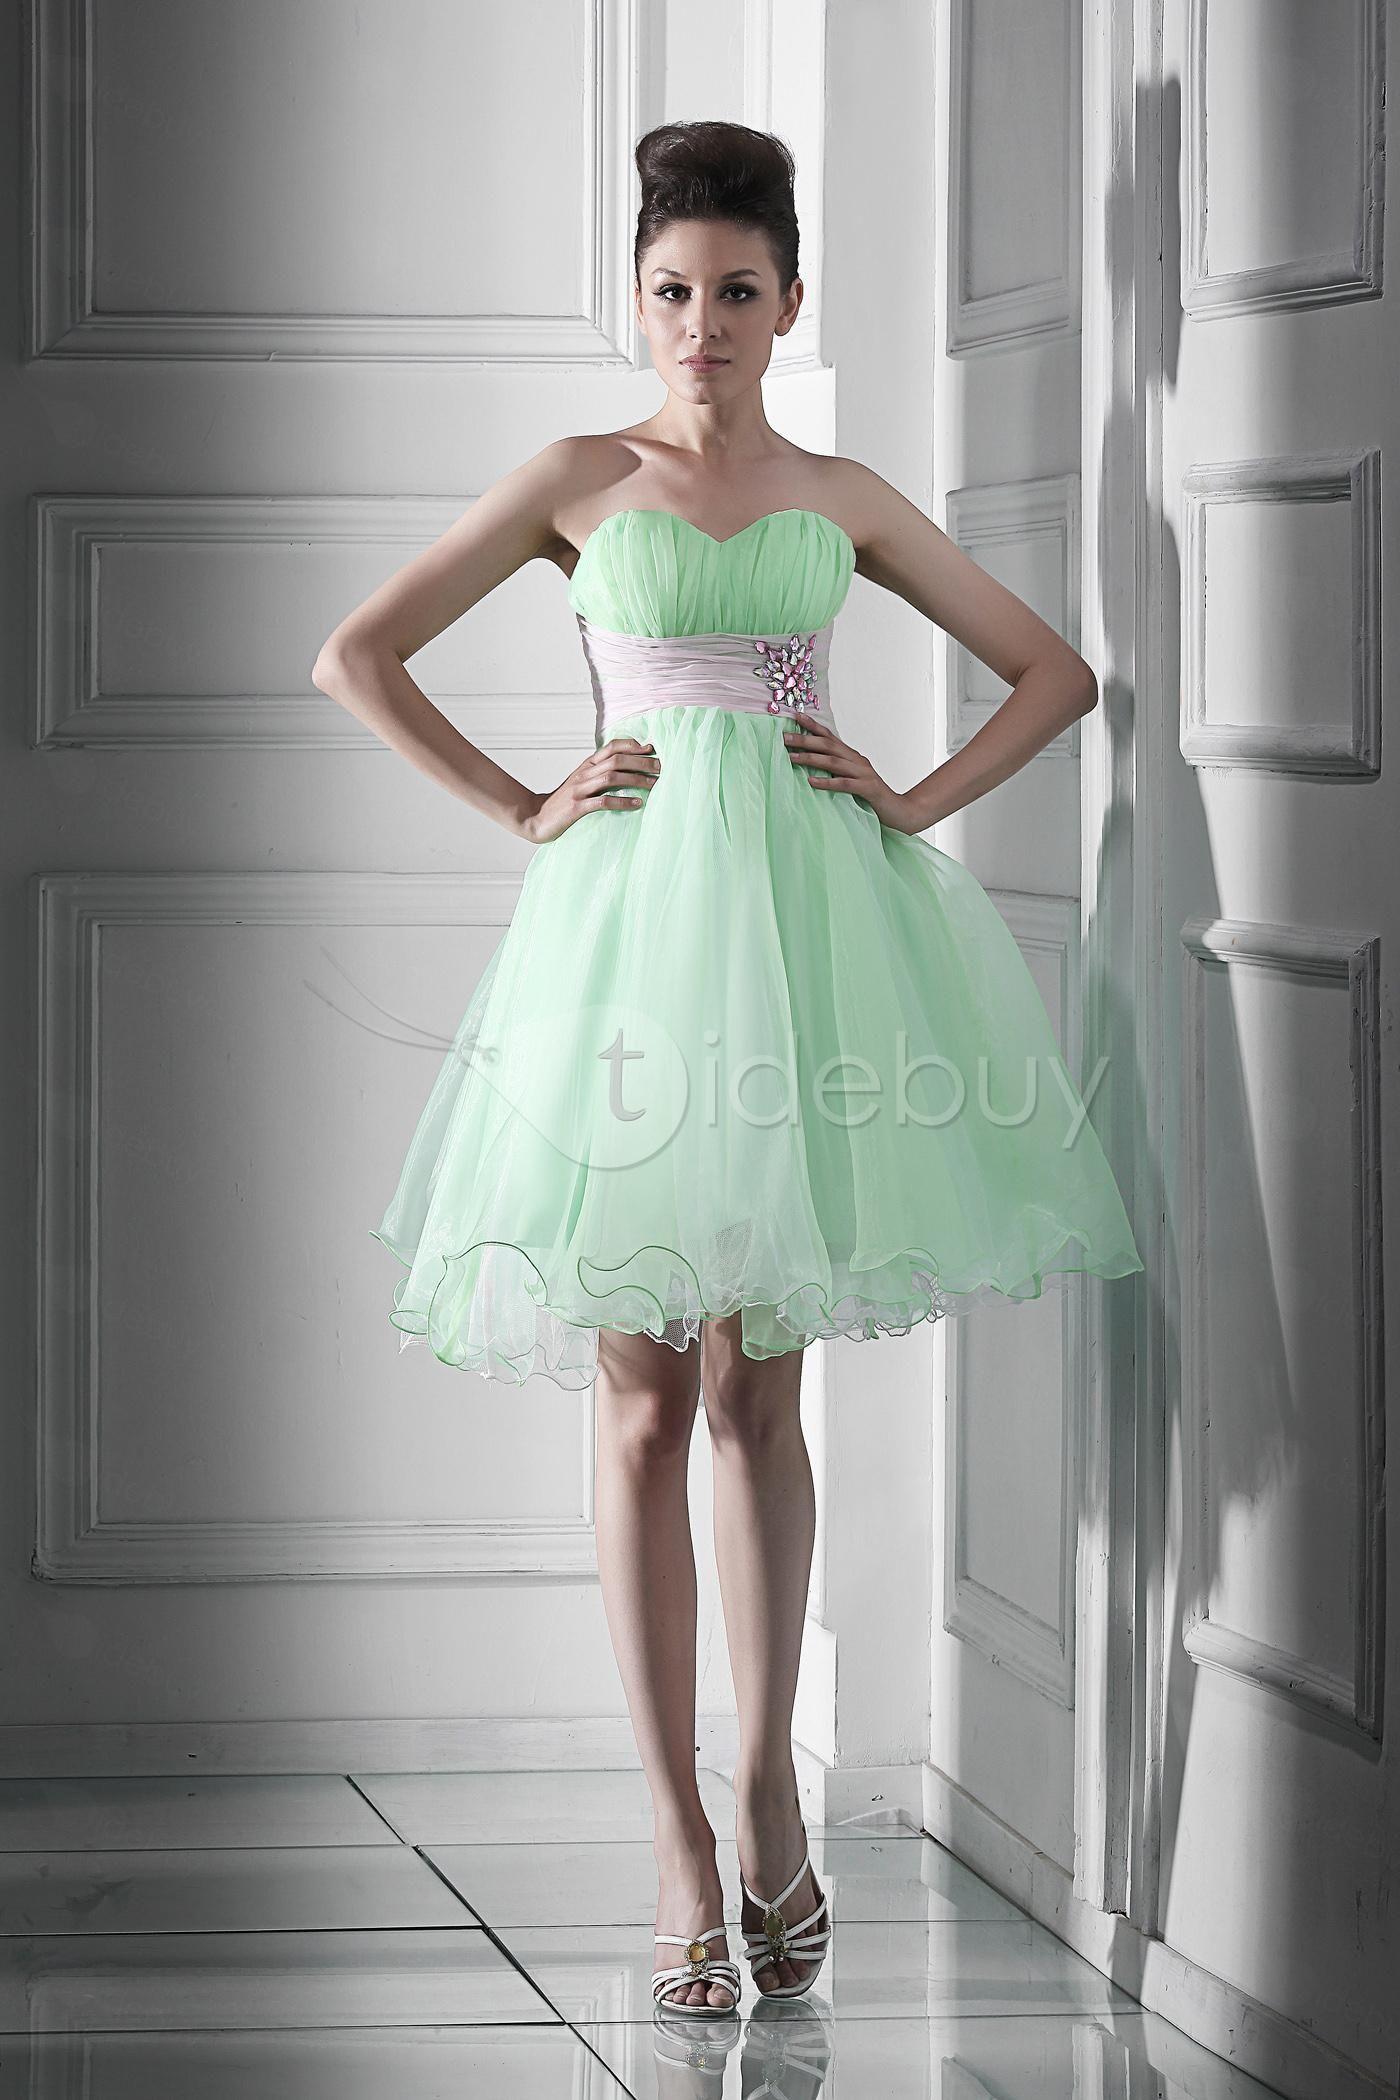 Cute Sweetheart Empire Waistline Beading Short Daria S Homecoming Sweet 16 Dress Homecoming Dresses Sweet 16 Dresses Winter Ball Dresses [ 2100 x 1400 Pixel ]